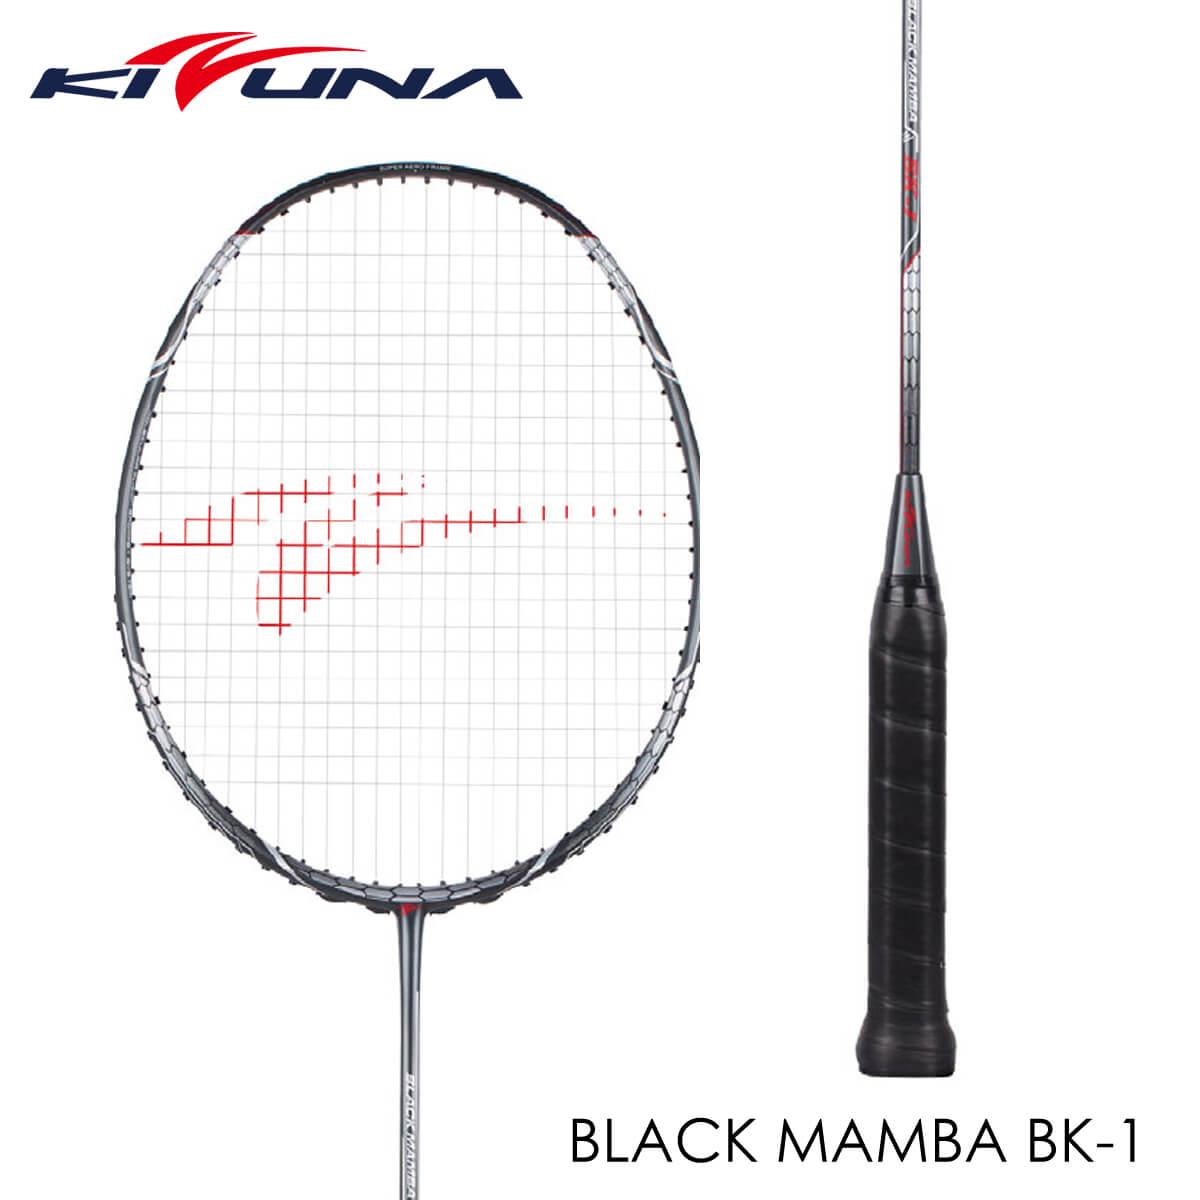 KIZUNA BM-BK1 BLACKMAMBA ブラックマンバ バドミントンラケット キズナ【ガット張り工賃無料/ 取り寄せ】